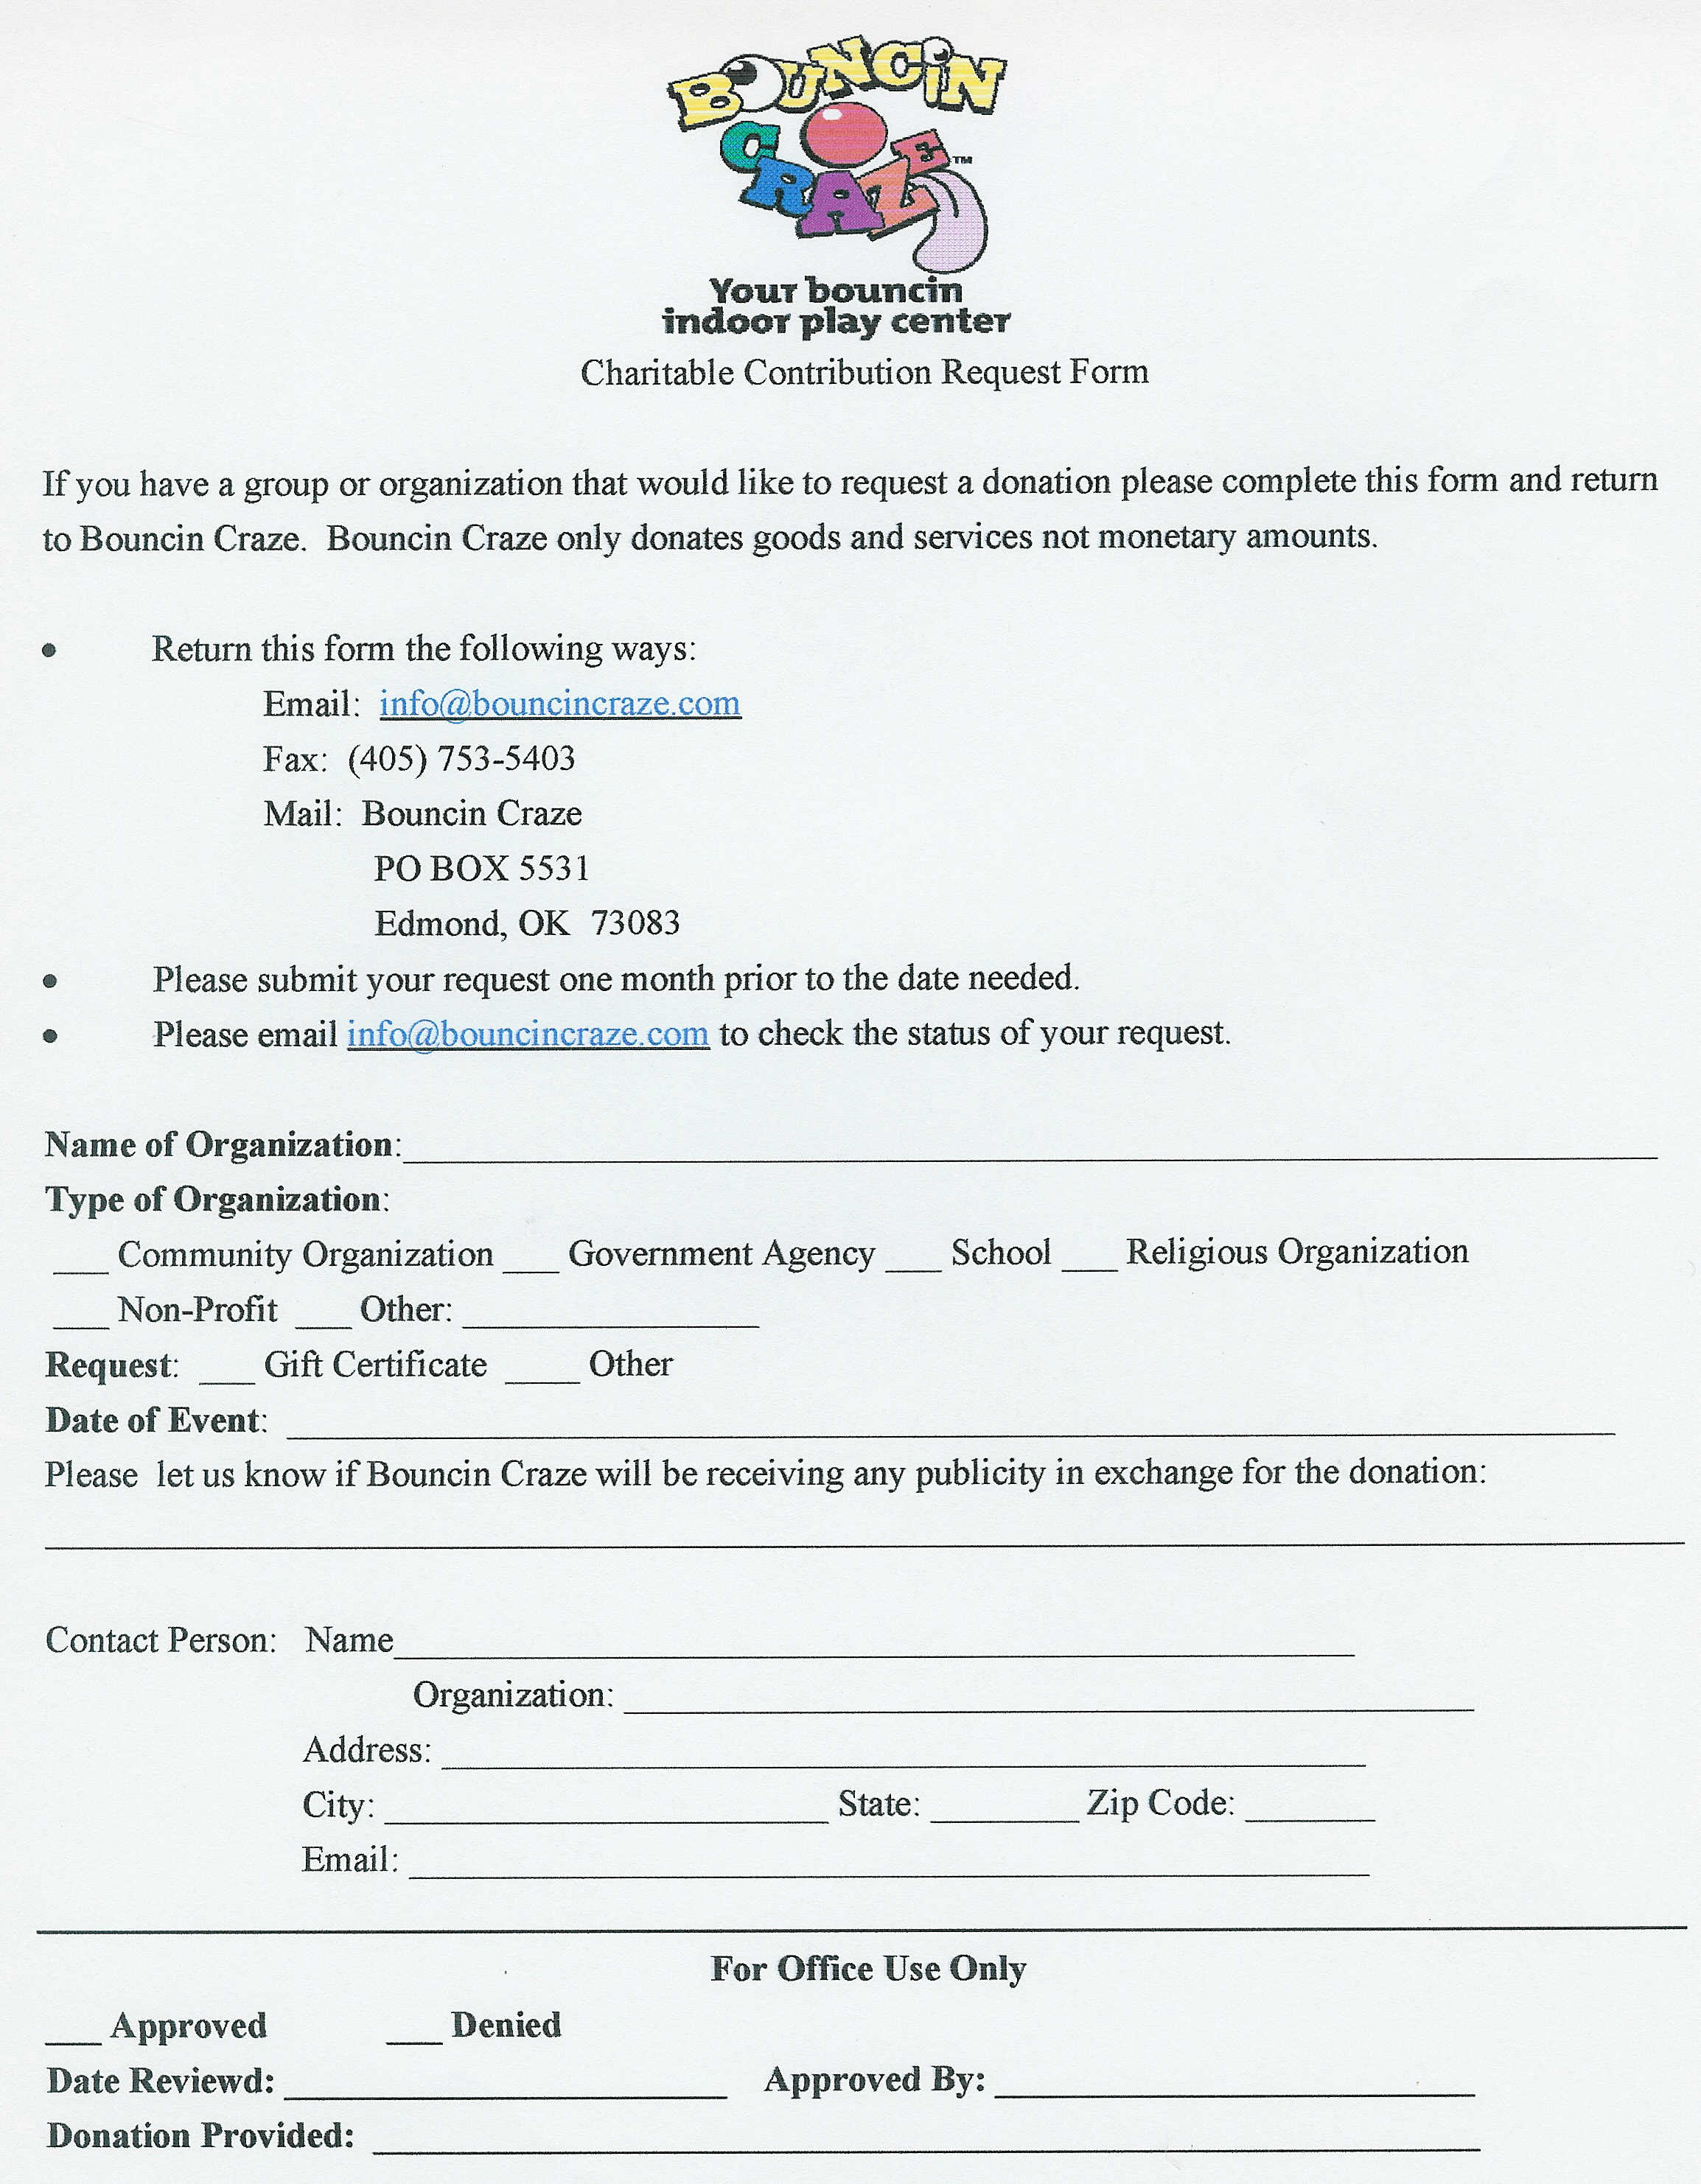 Bouncin Craze Community Support – Donation Request Form